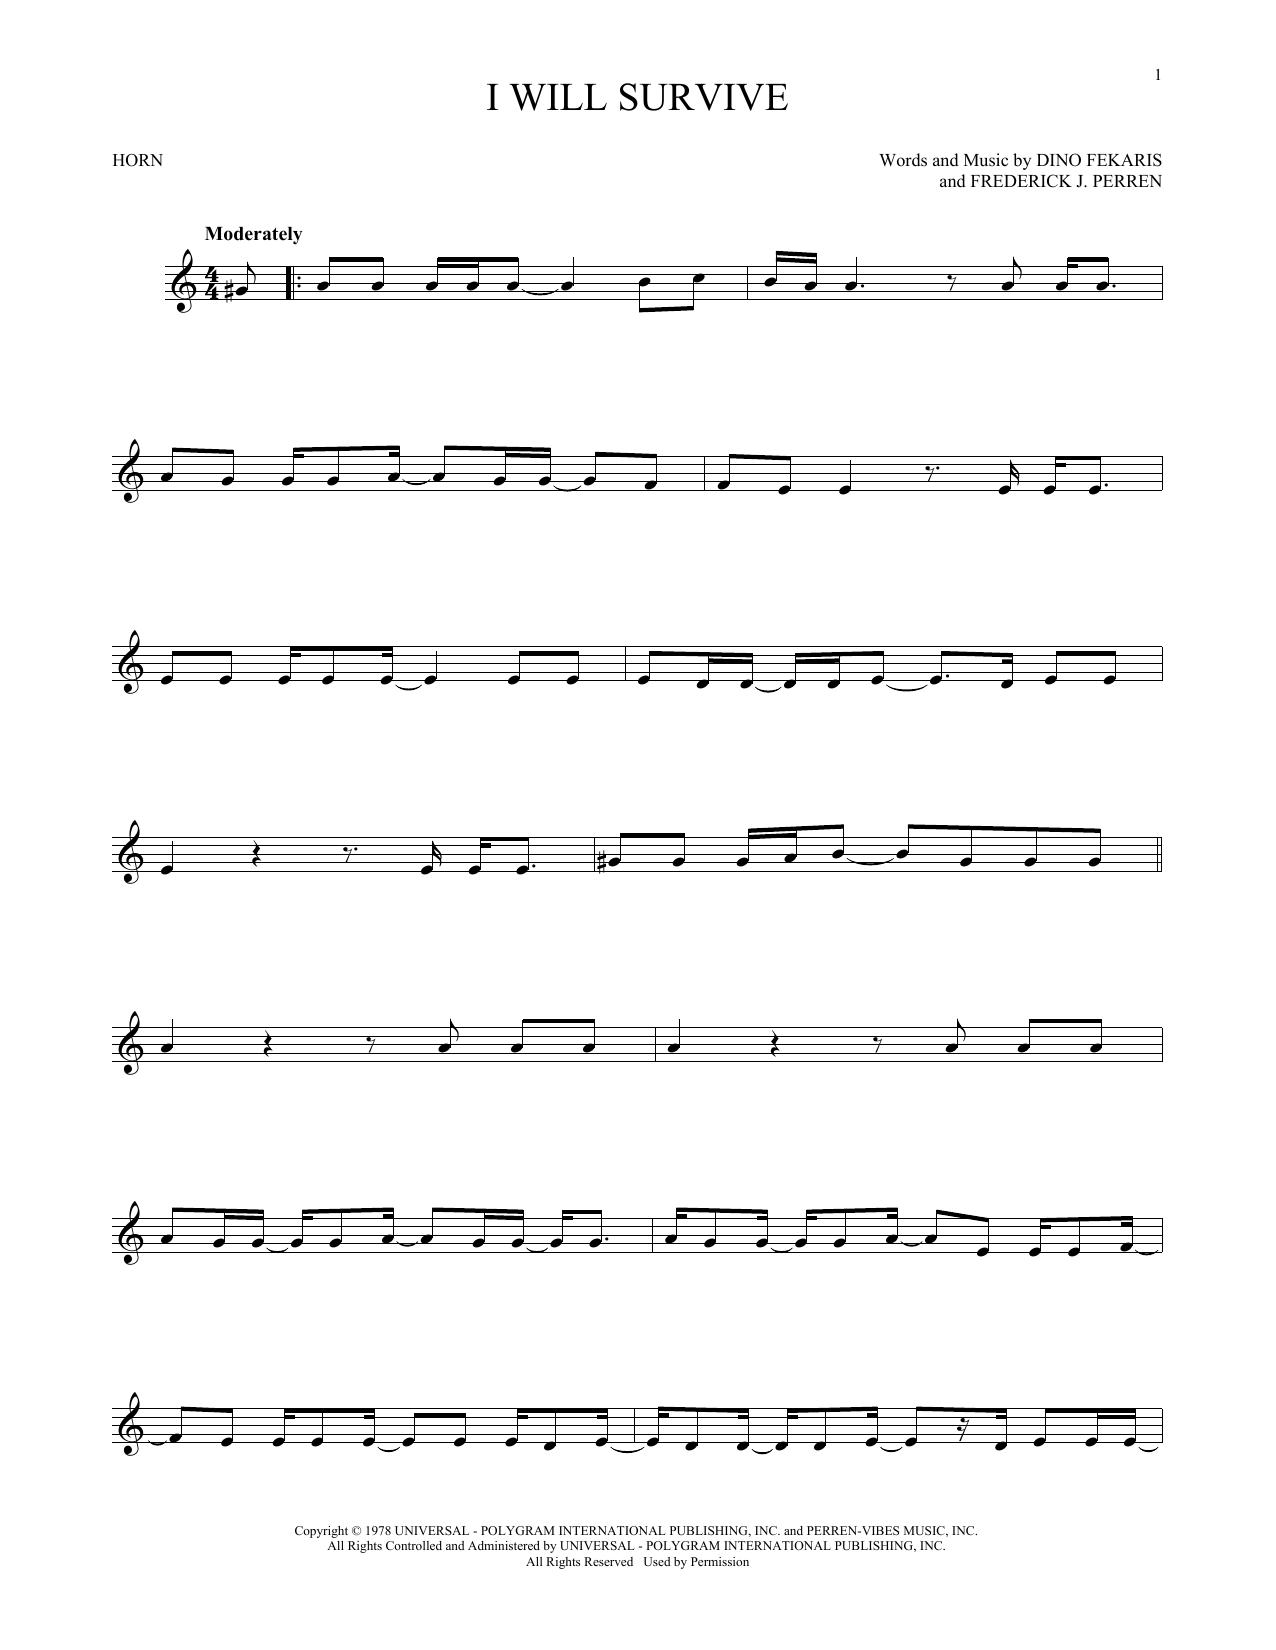 Sheet Music Digital Files To Print Licensed Gloria Gaynor Digital